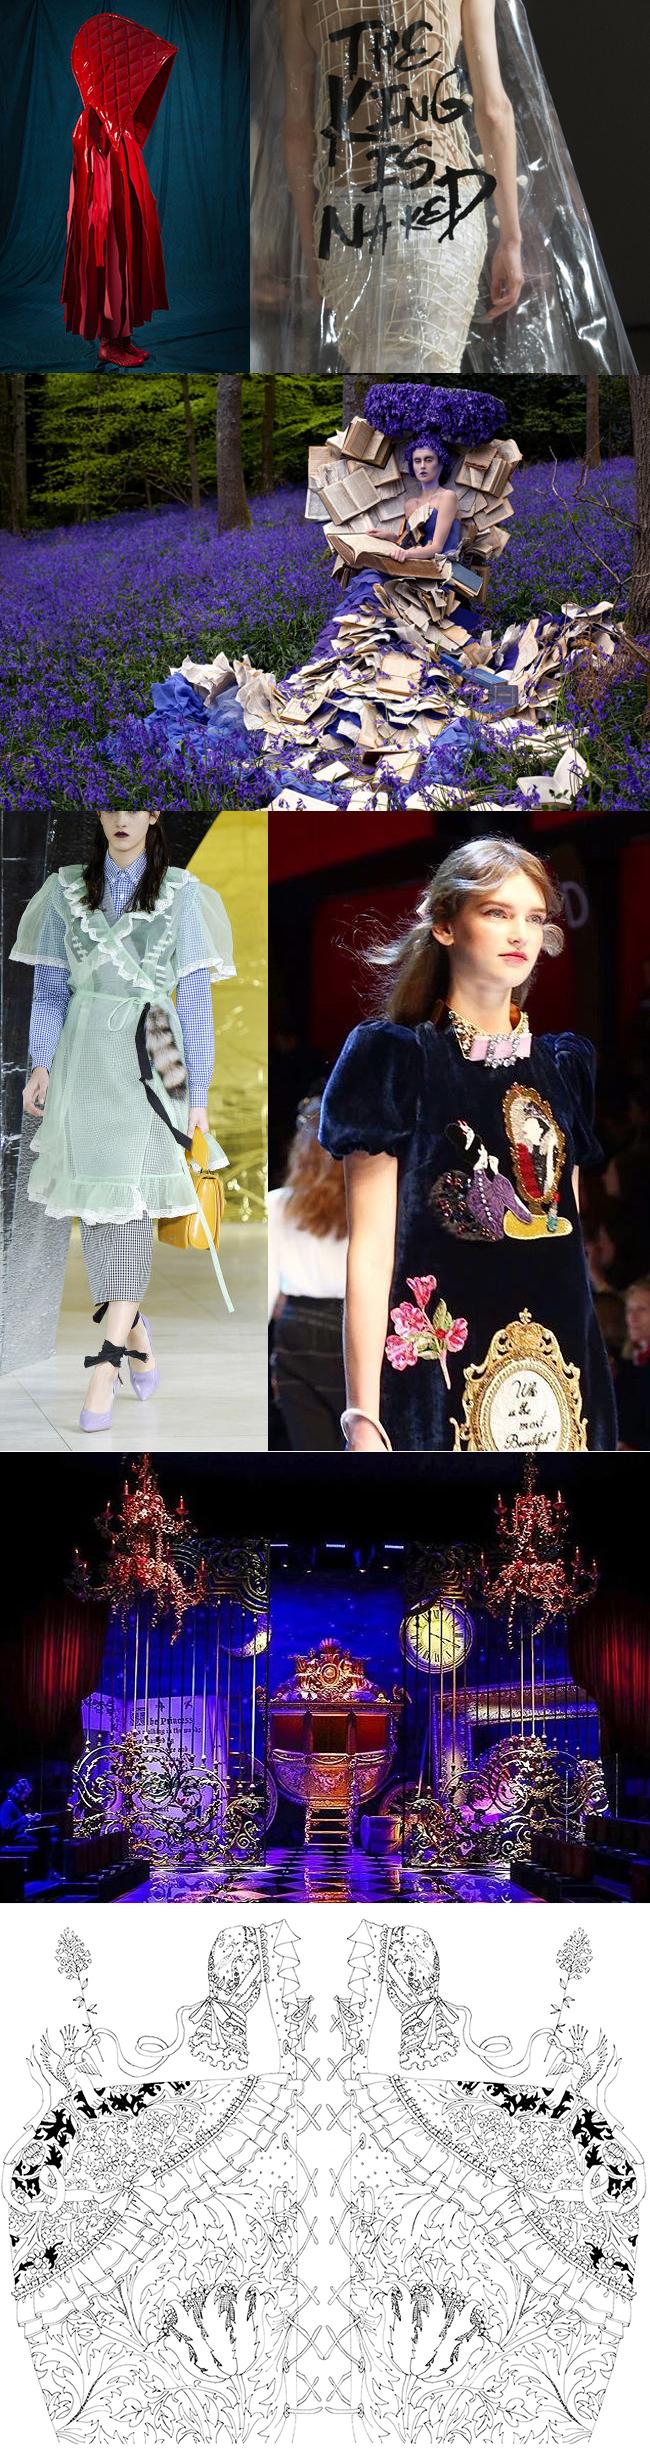 fairytales fashion color me enchanted by masha d'yans